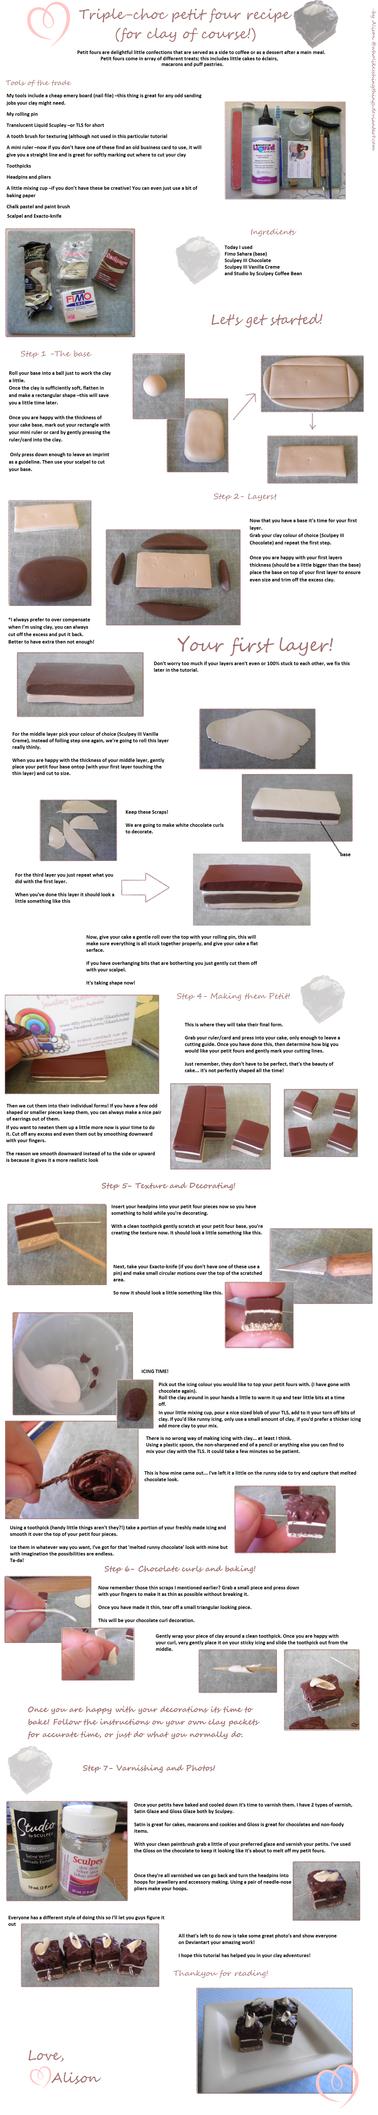 Petit Four tutorial -LONG by ilikeshiniesfakery